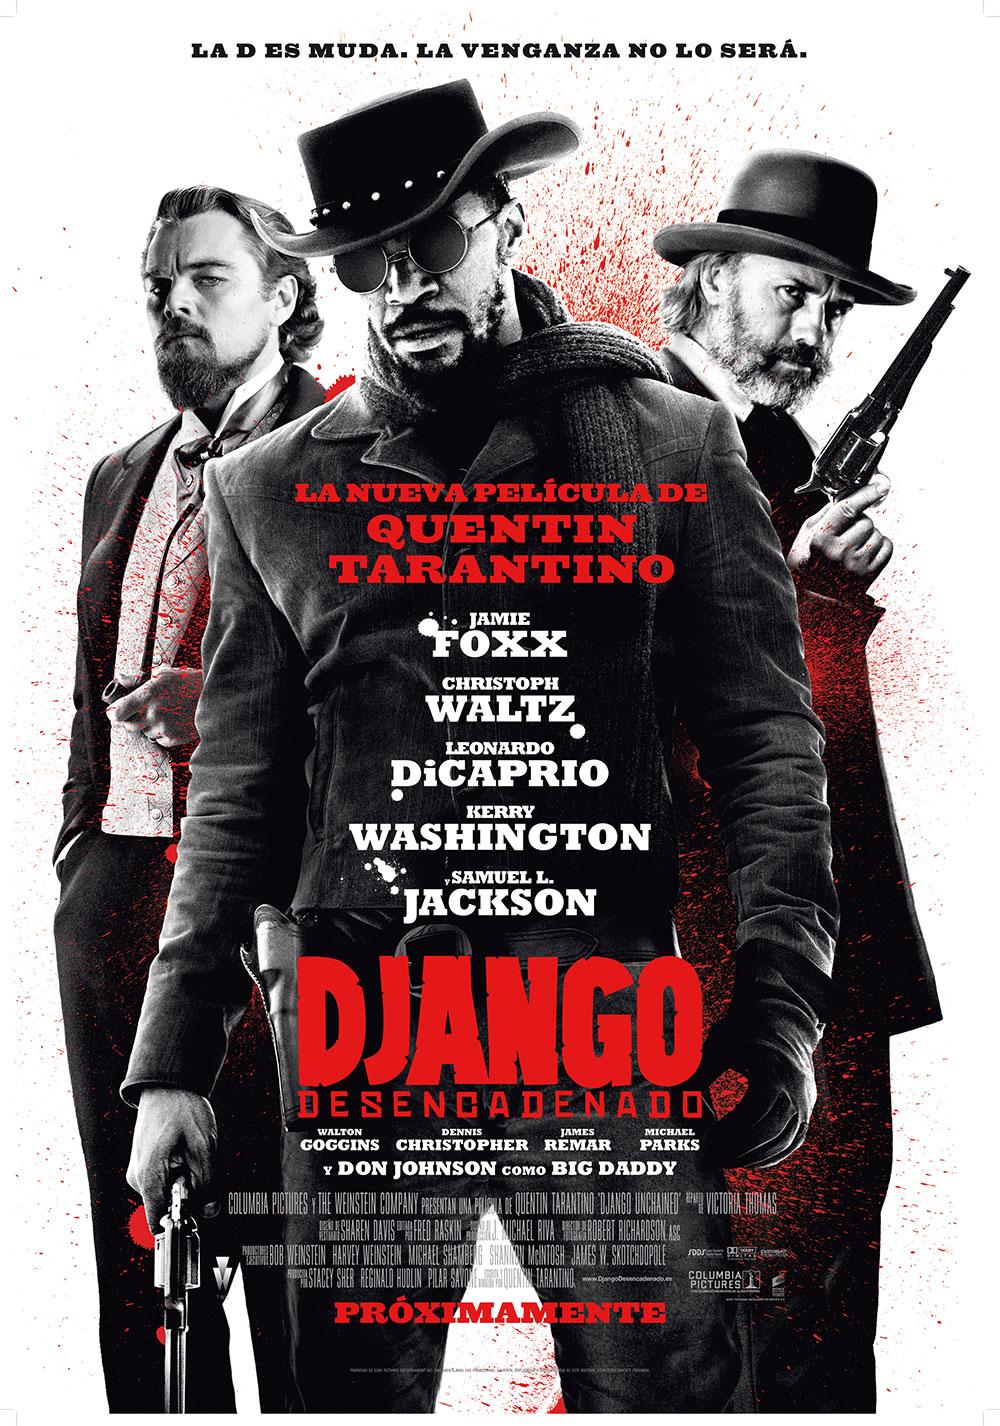 Django desencadenado. cartel español